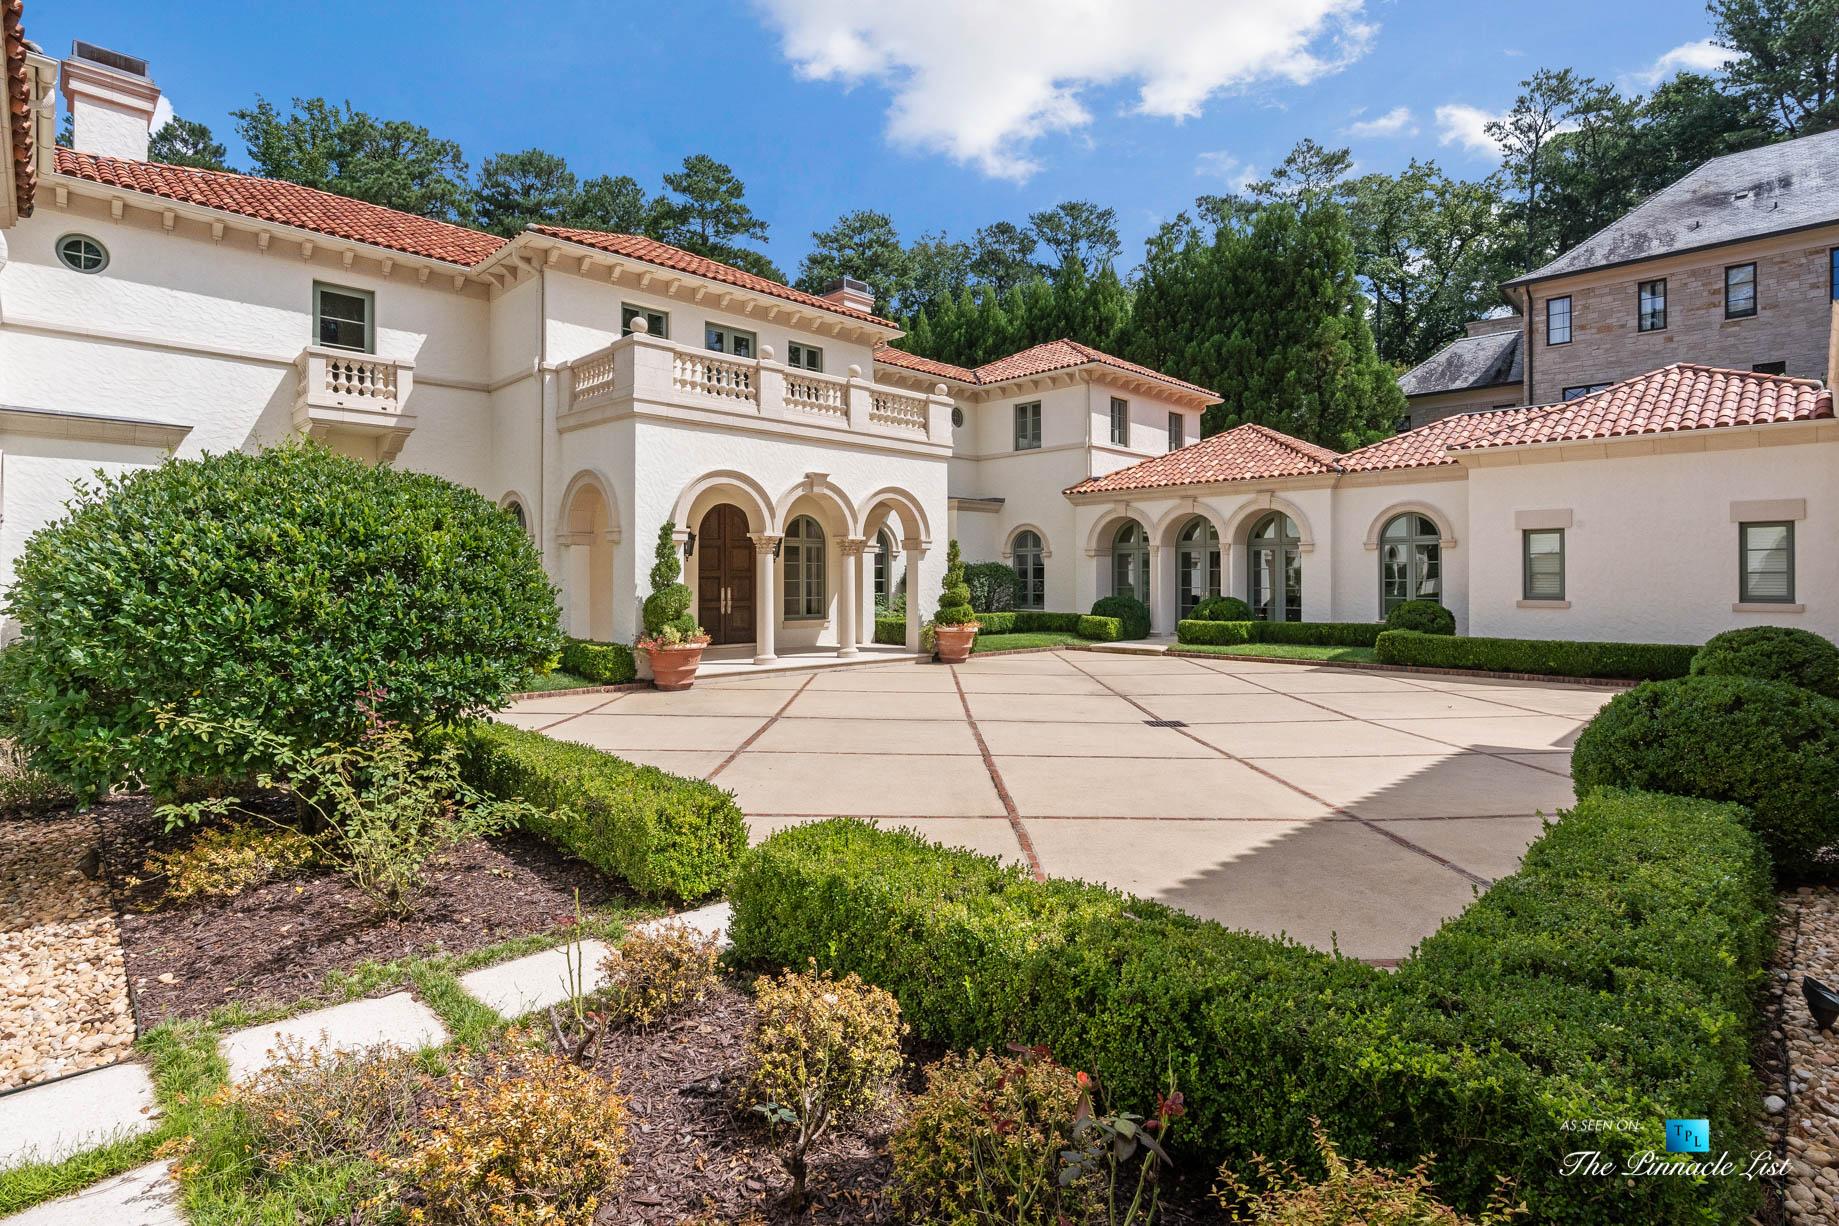 439 Blackland Rd NW, Atlanta, GA, USA - Inner Courtyard Driveway - Luxury Real Estate - Tuxedo Park Mediterranean Mansion Home